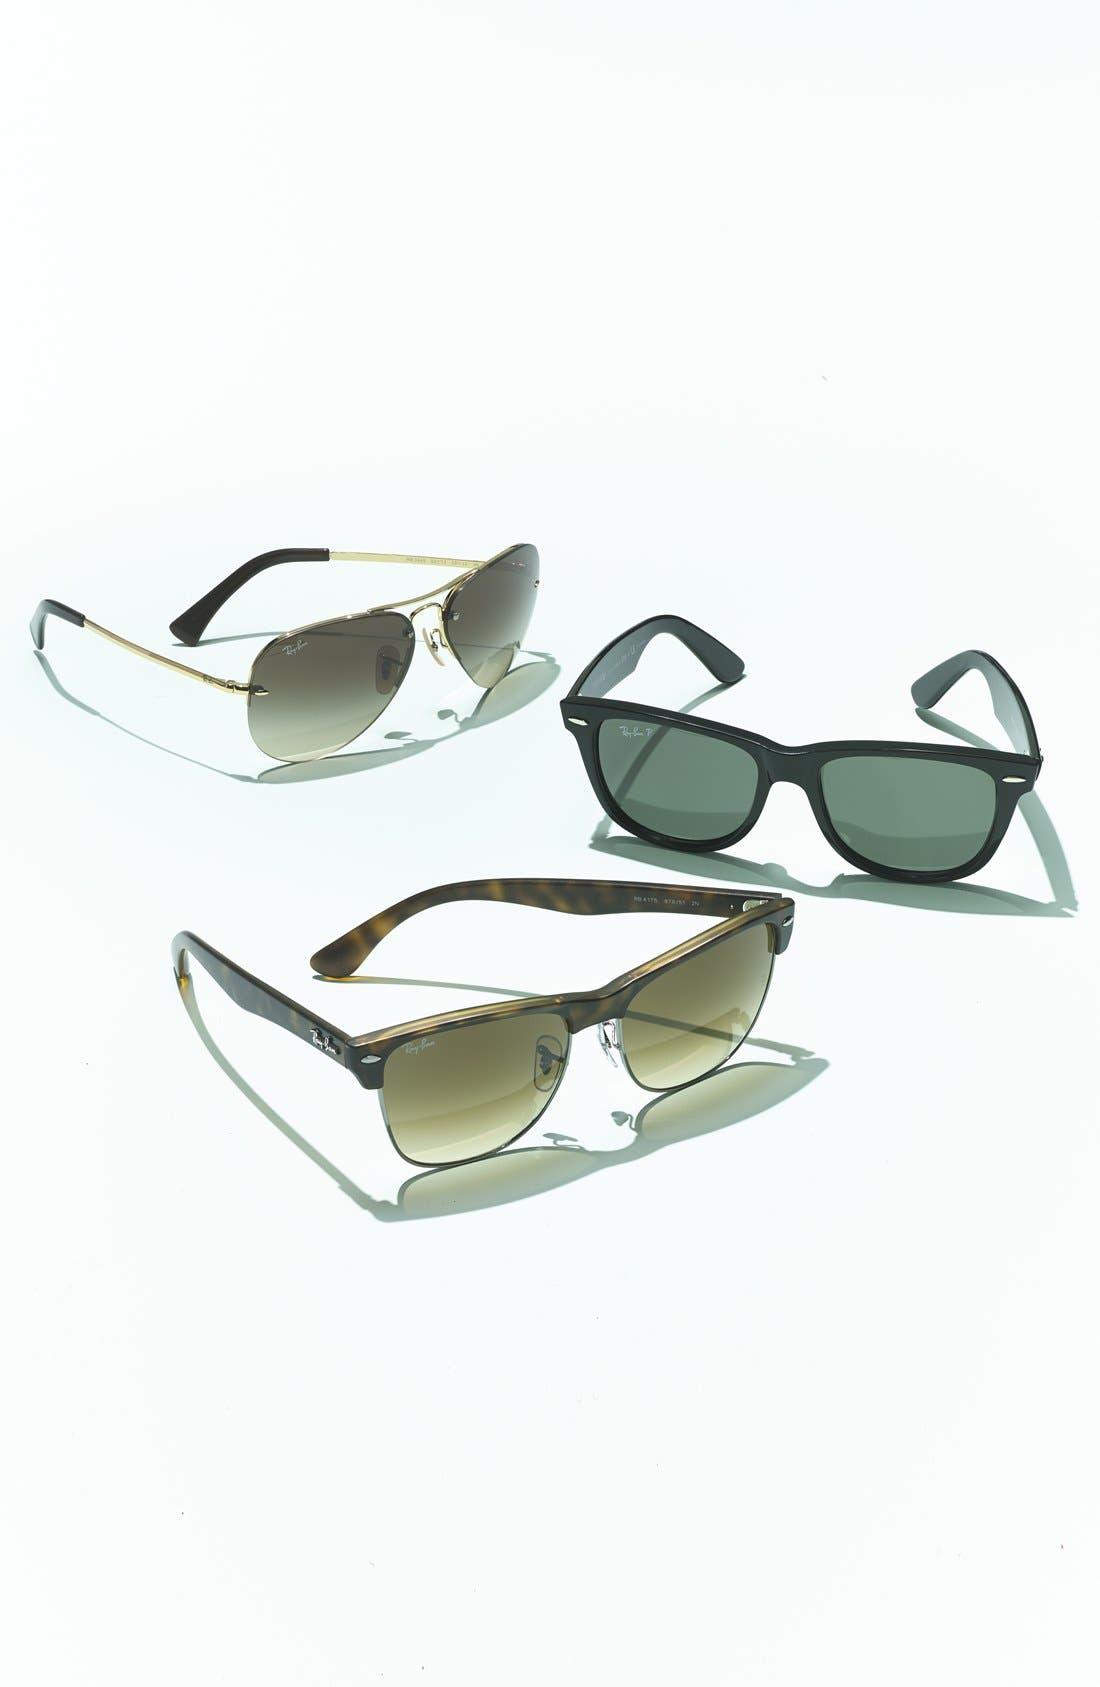 Standard Classic Wayfarer 50mm Polarized Sunglasses,                             Alternate thumbnail 4, color,                             BLACK POLARIZED